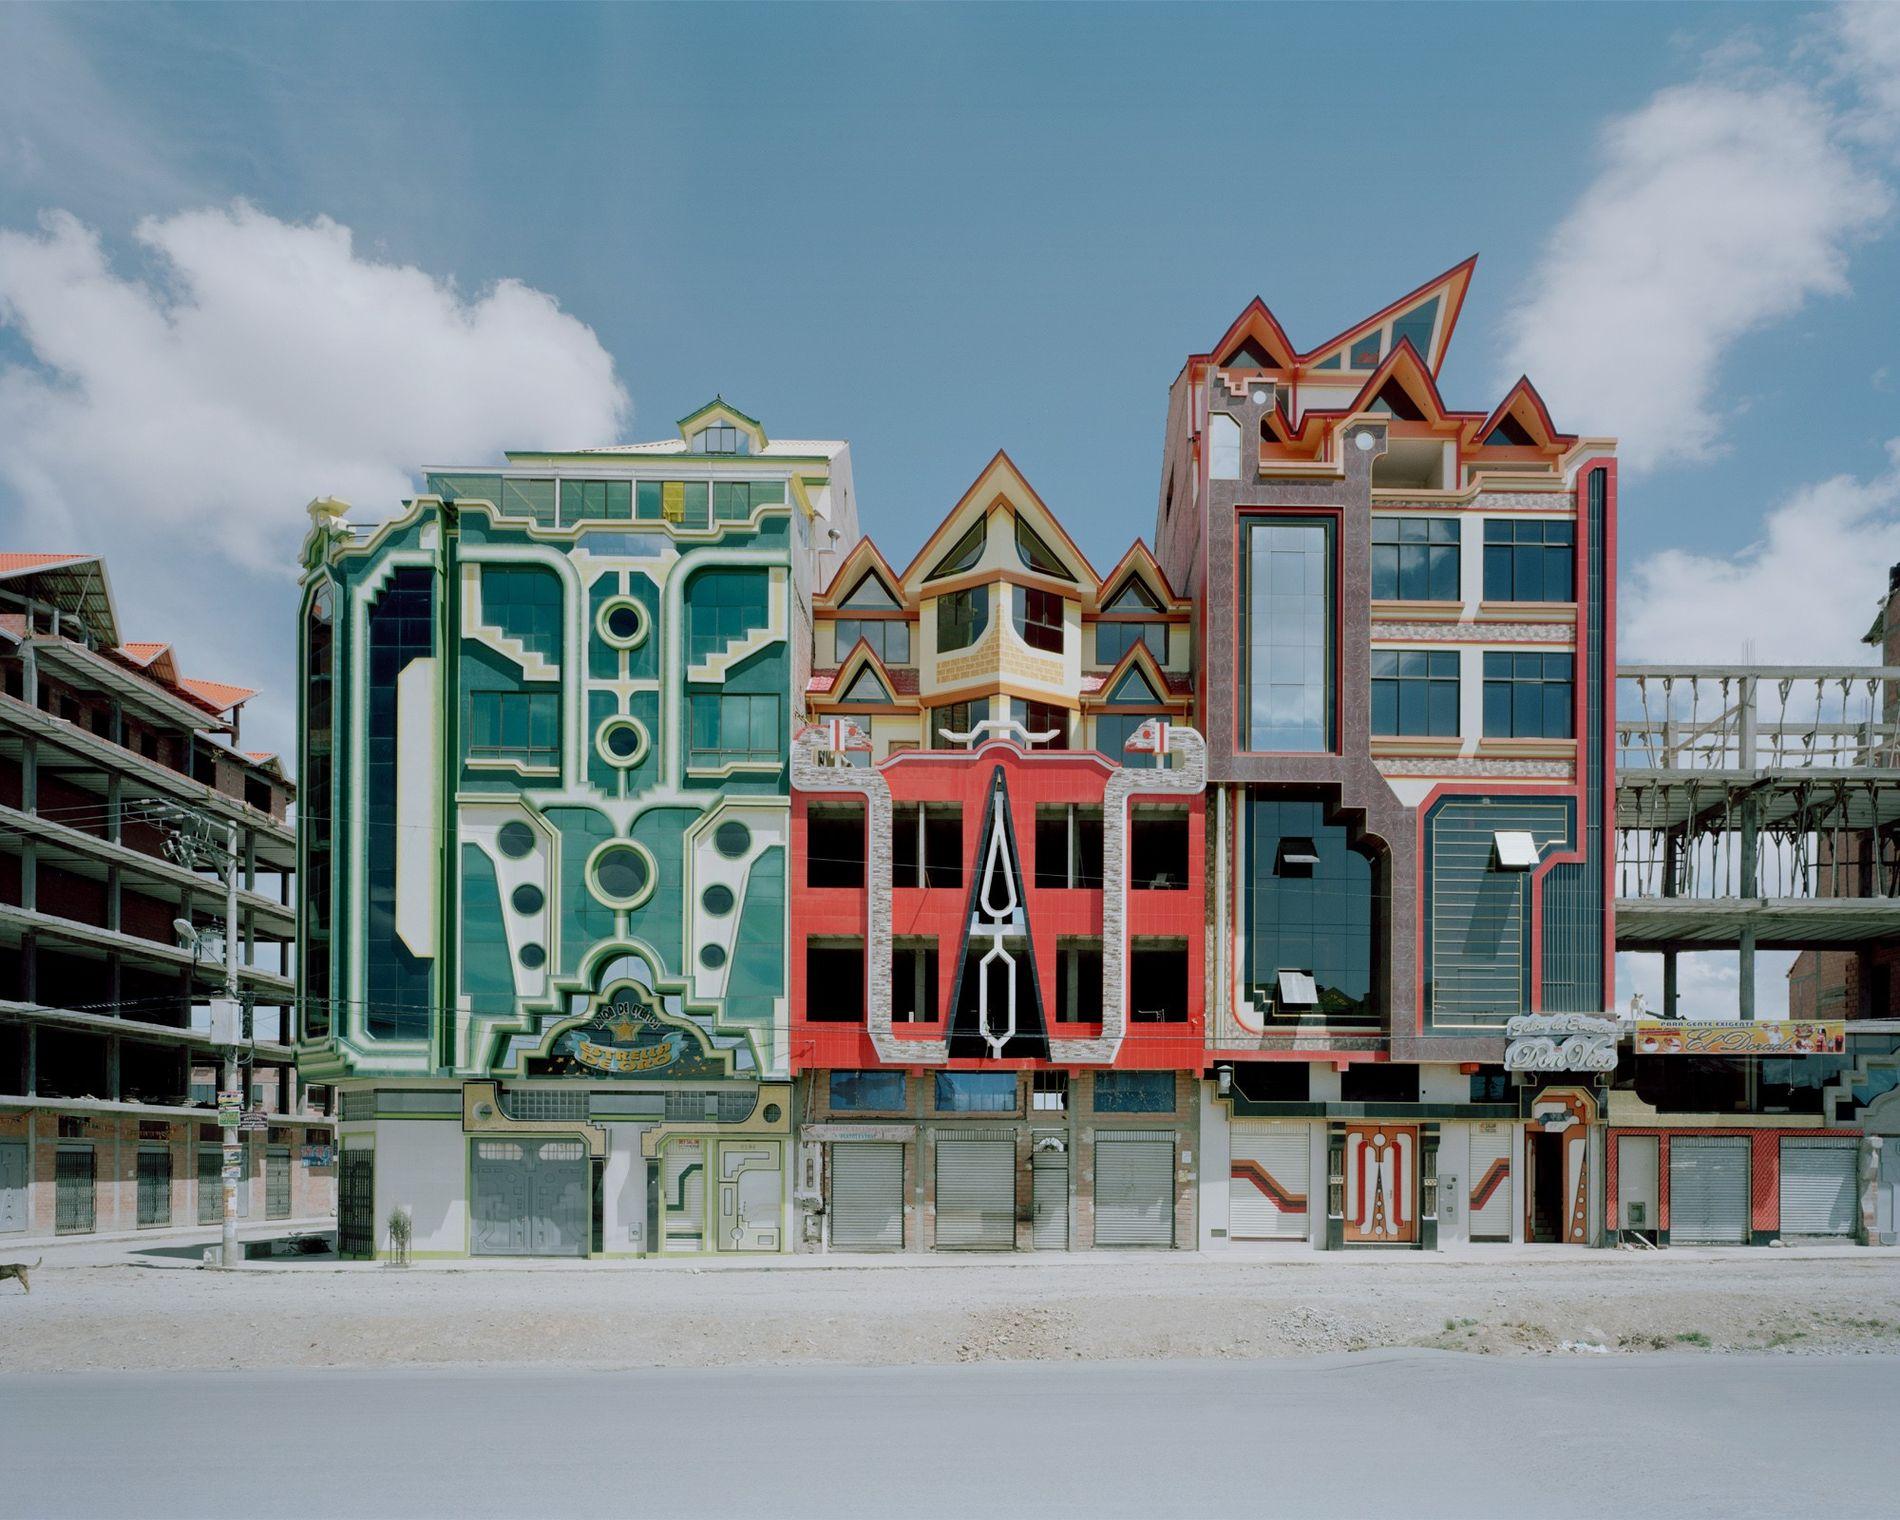 Bolivian architect Freddy Mamani's colourful designs are changing the face of El Alto.